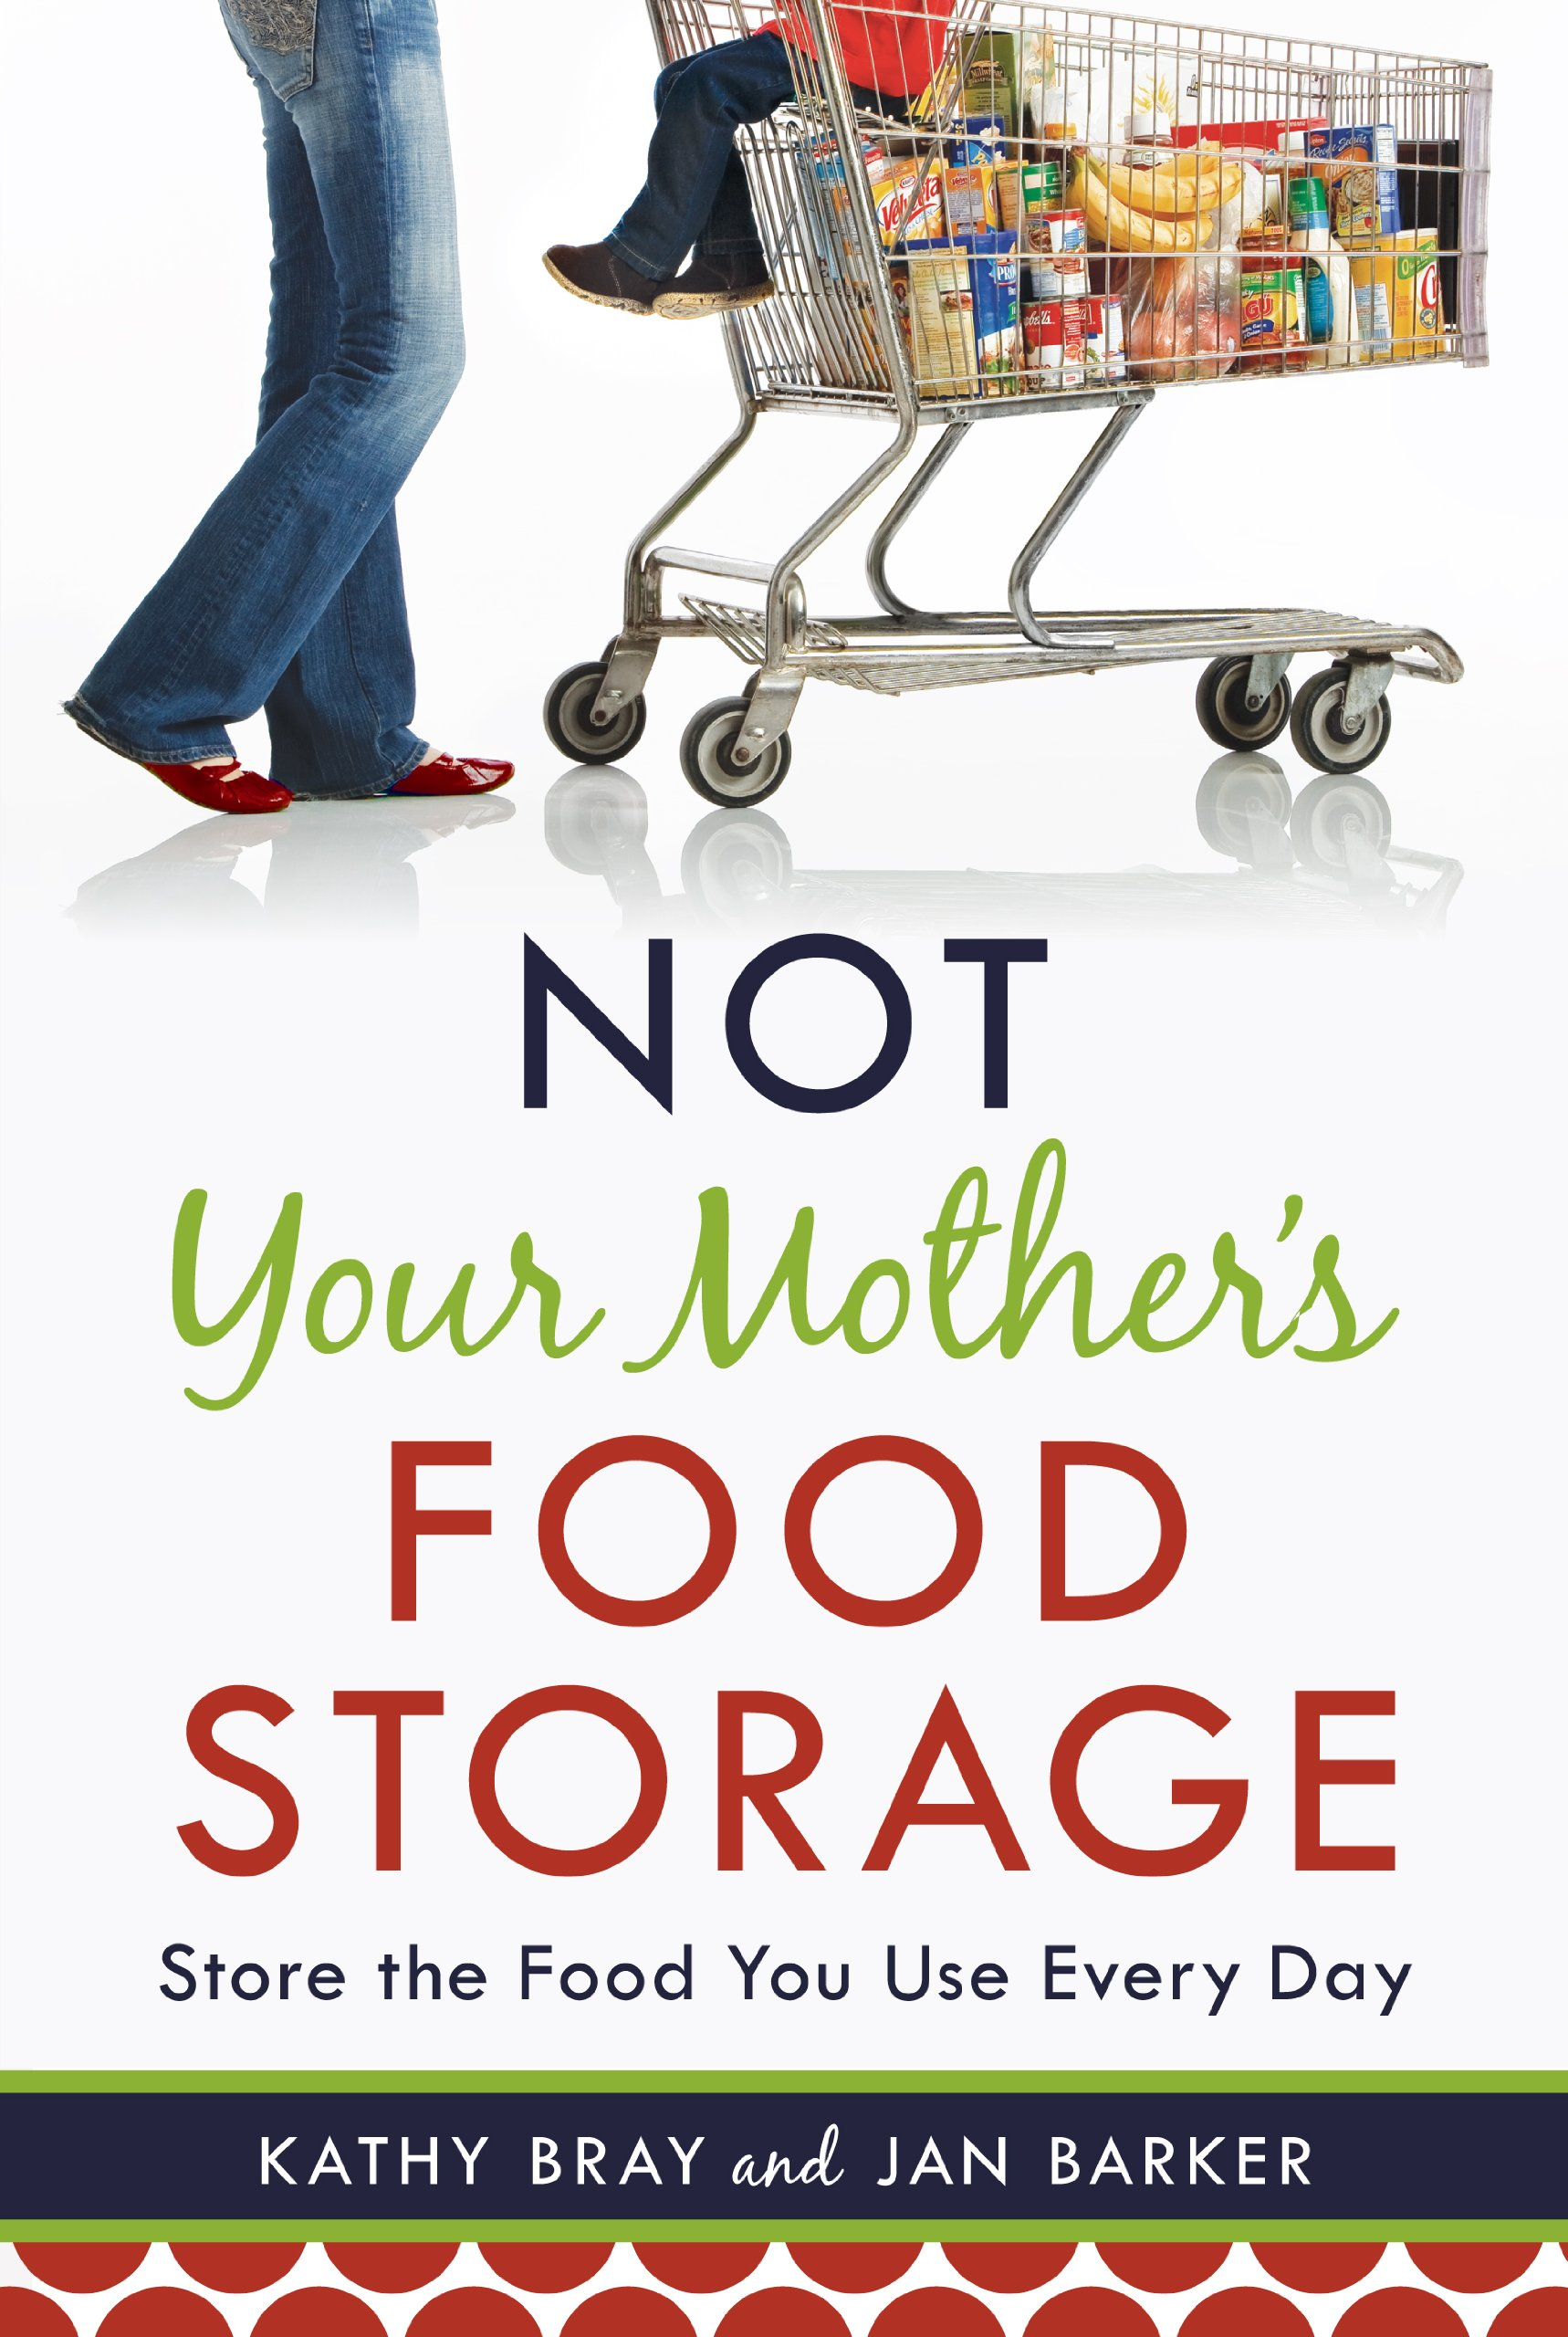 Not your mothers food storage kathy bray jan barker not your mothers food storage kathy bray jan barker 9781606416662 amazon books forumfinder Choice Image